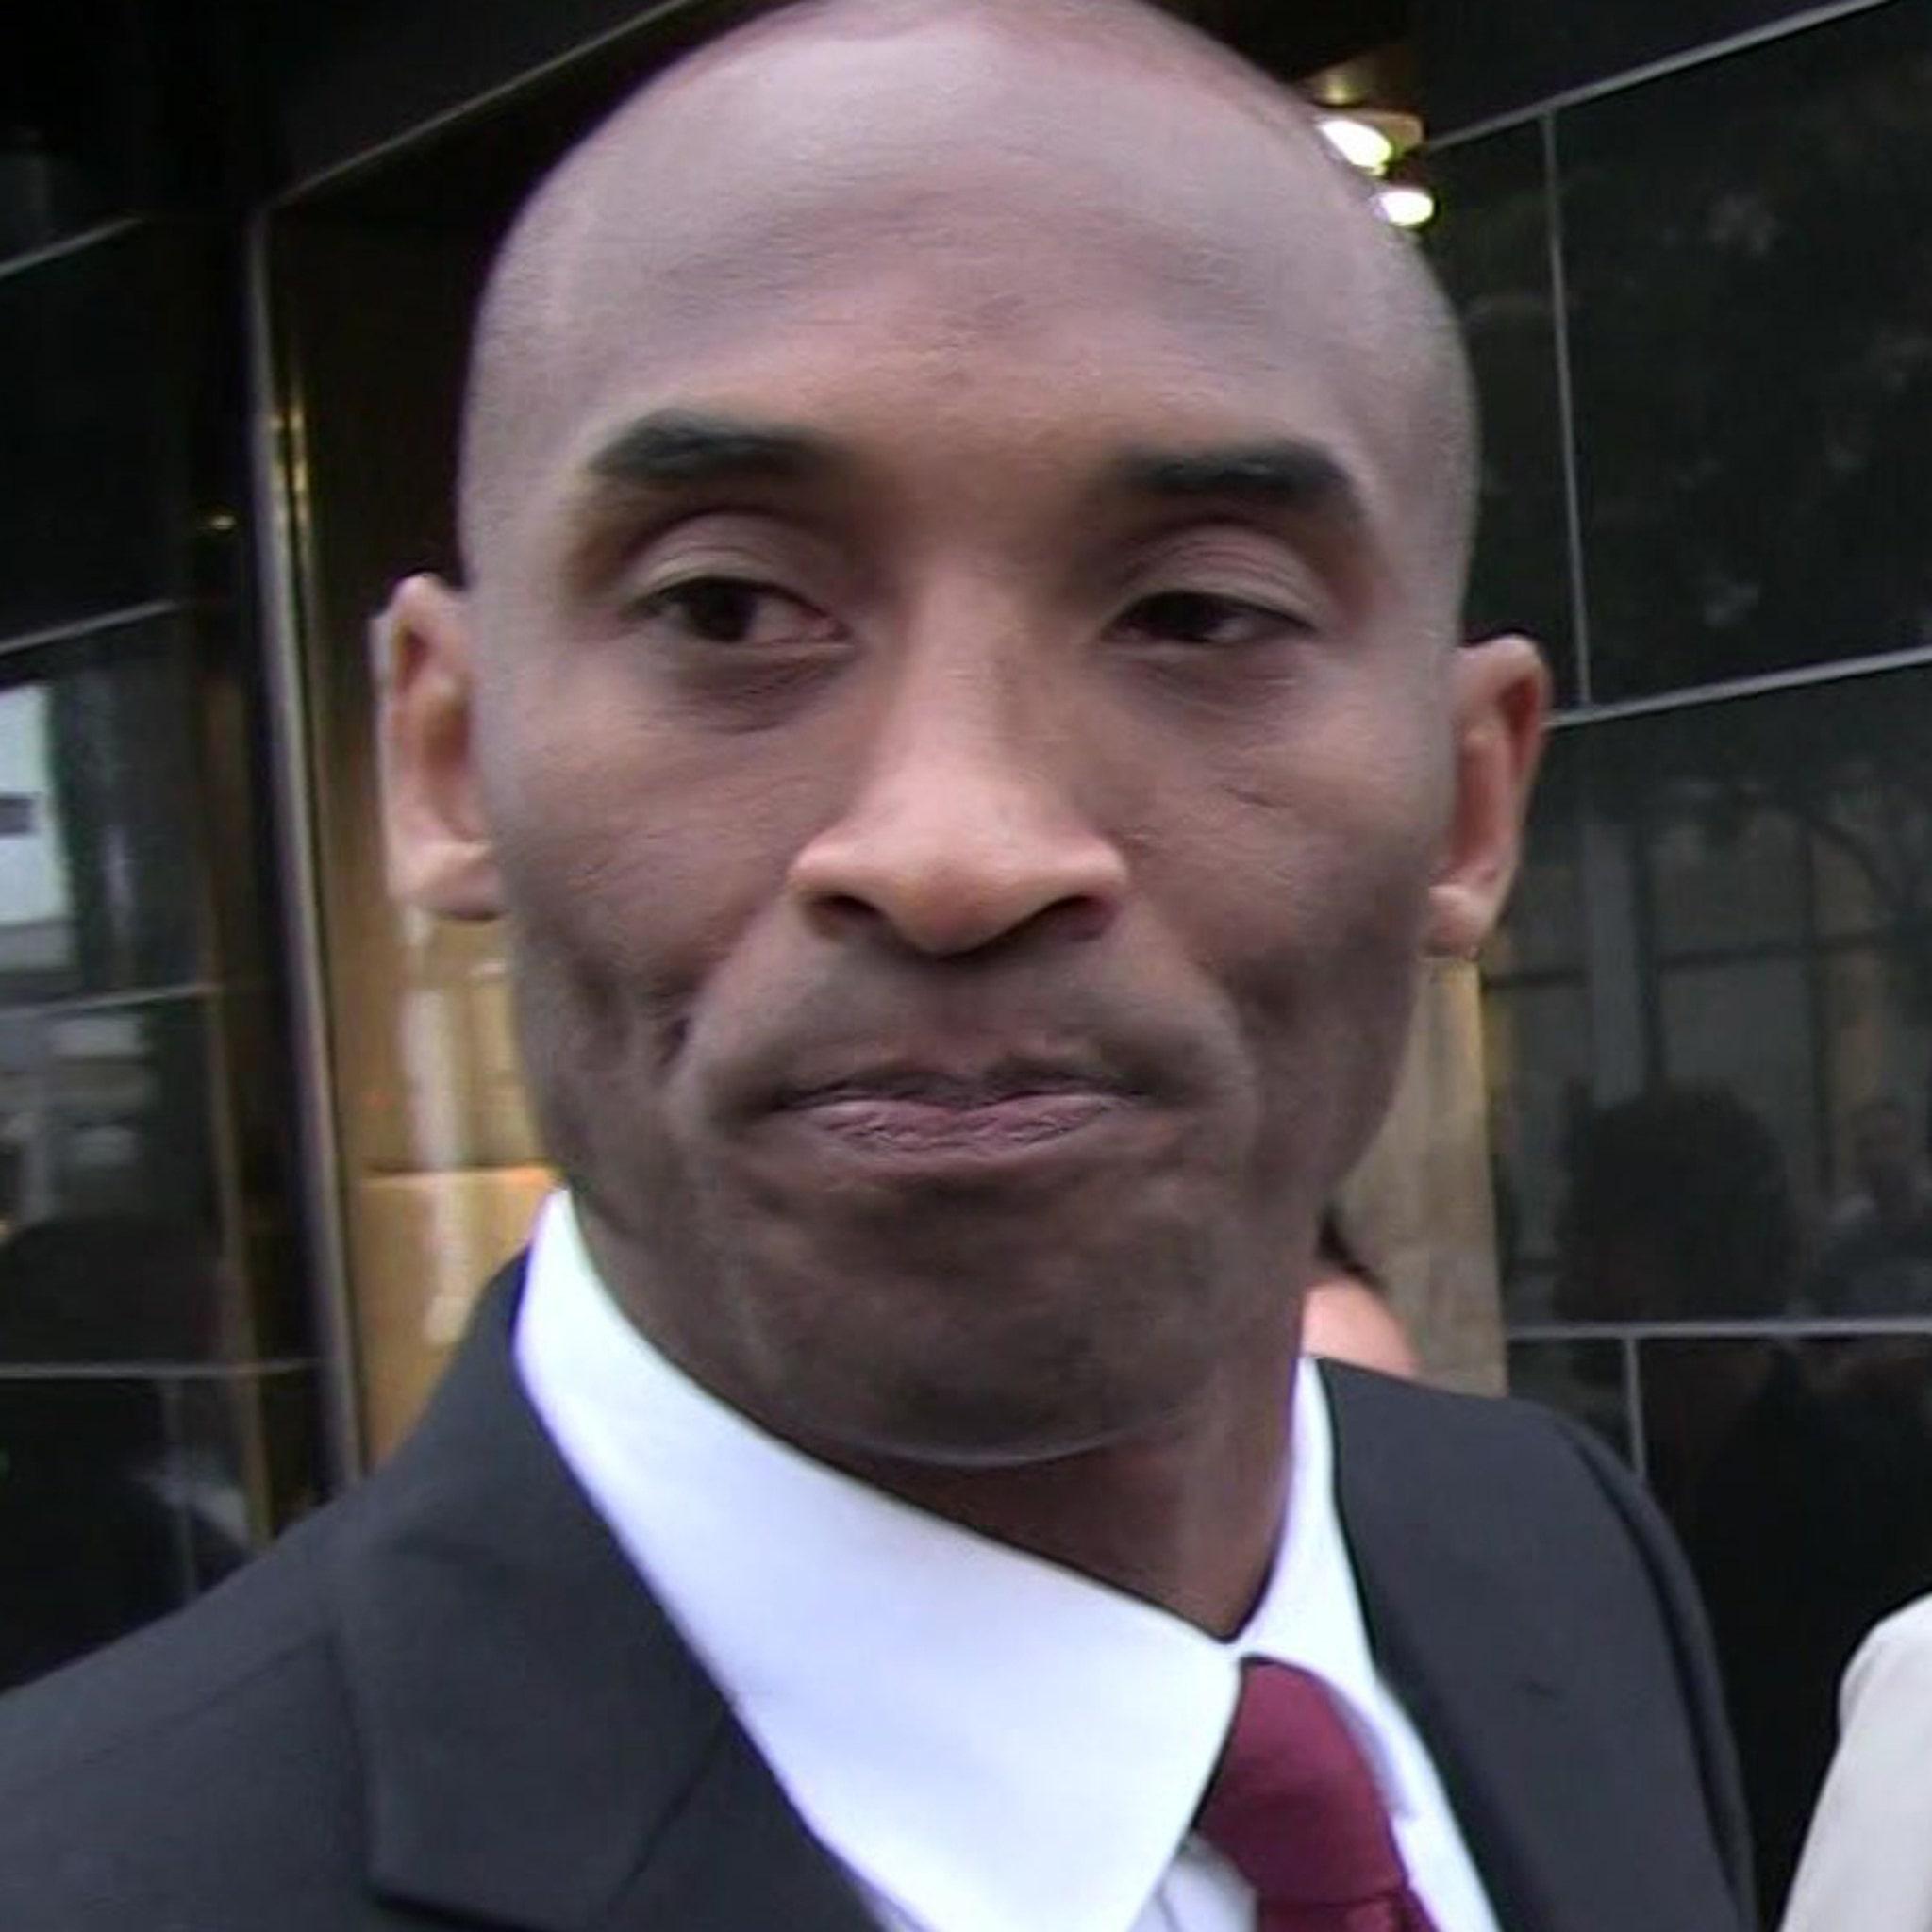 Kobe Bryant Memorabilia Prices Soar, Scumbags Pushing Fakes